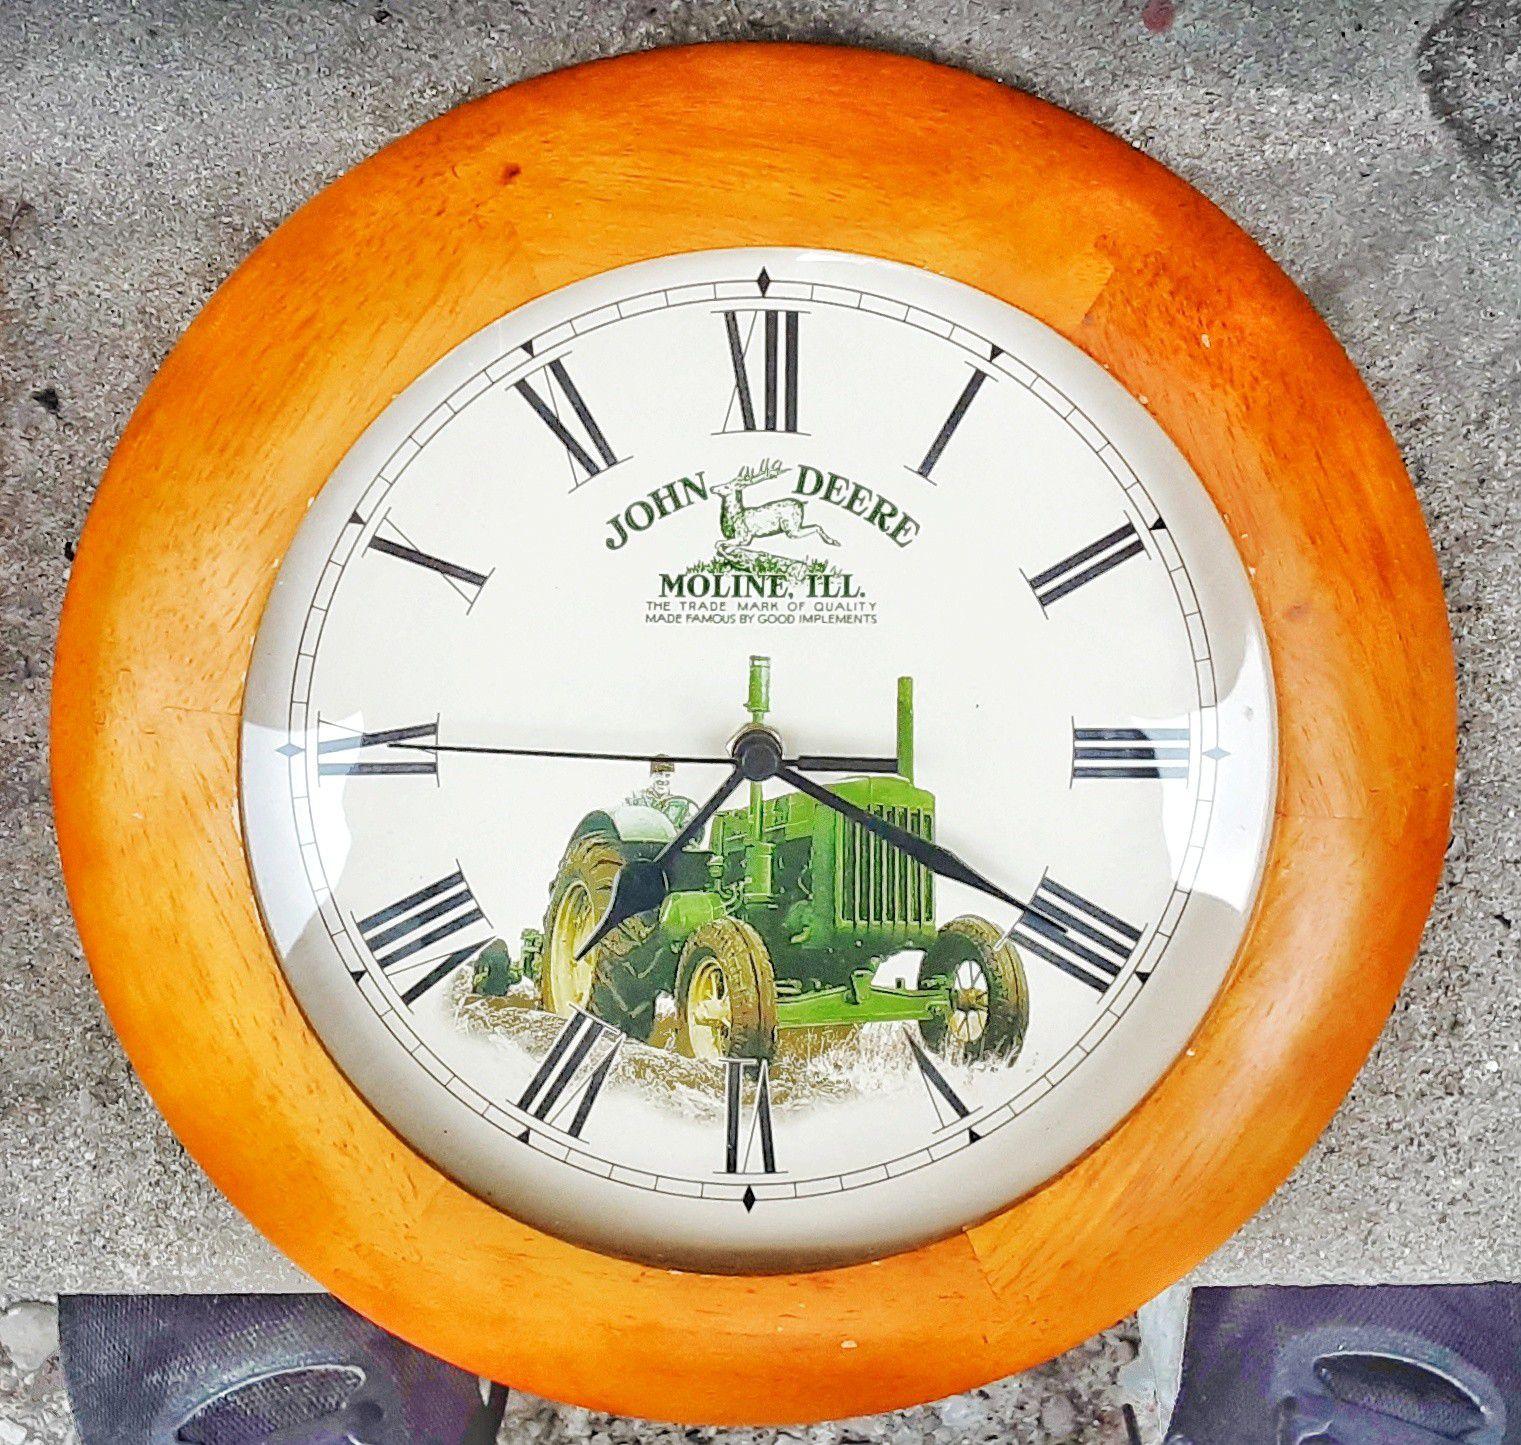 "John Deere moline Illinois green tractor 11"" D quartz wall clock with new AA battery!"